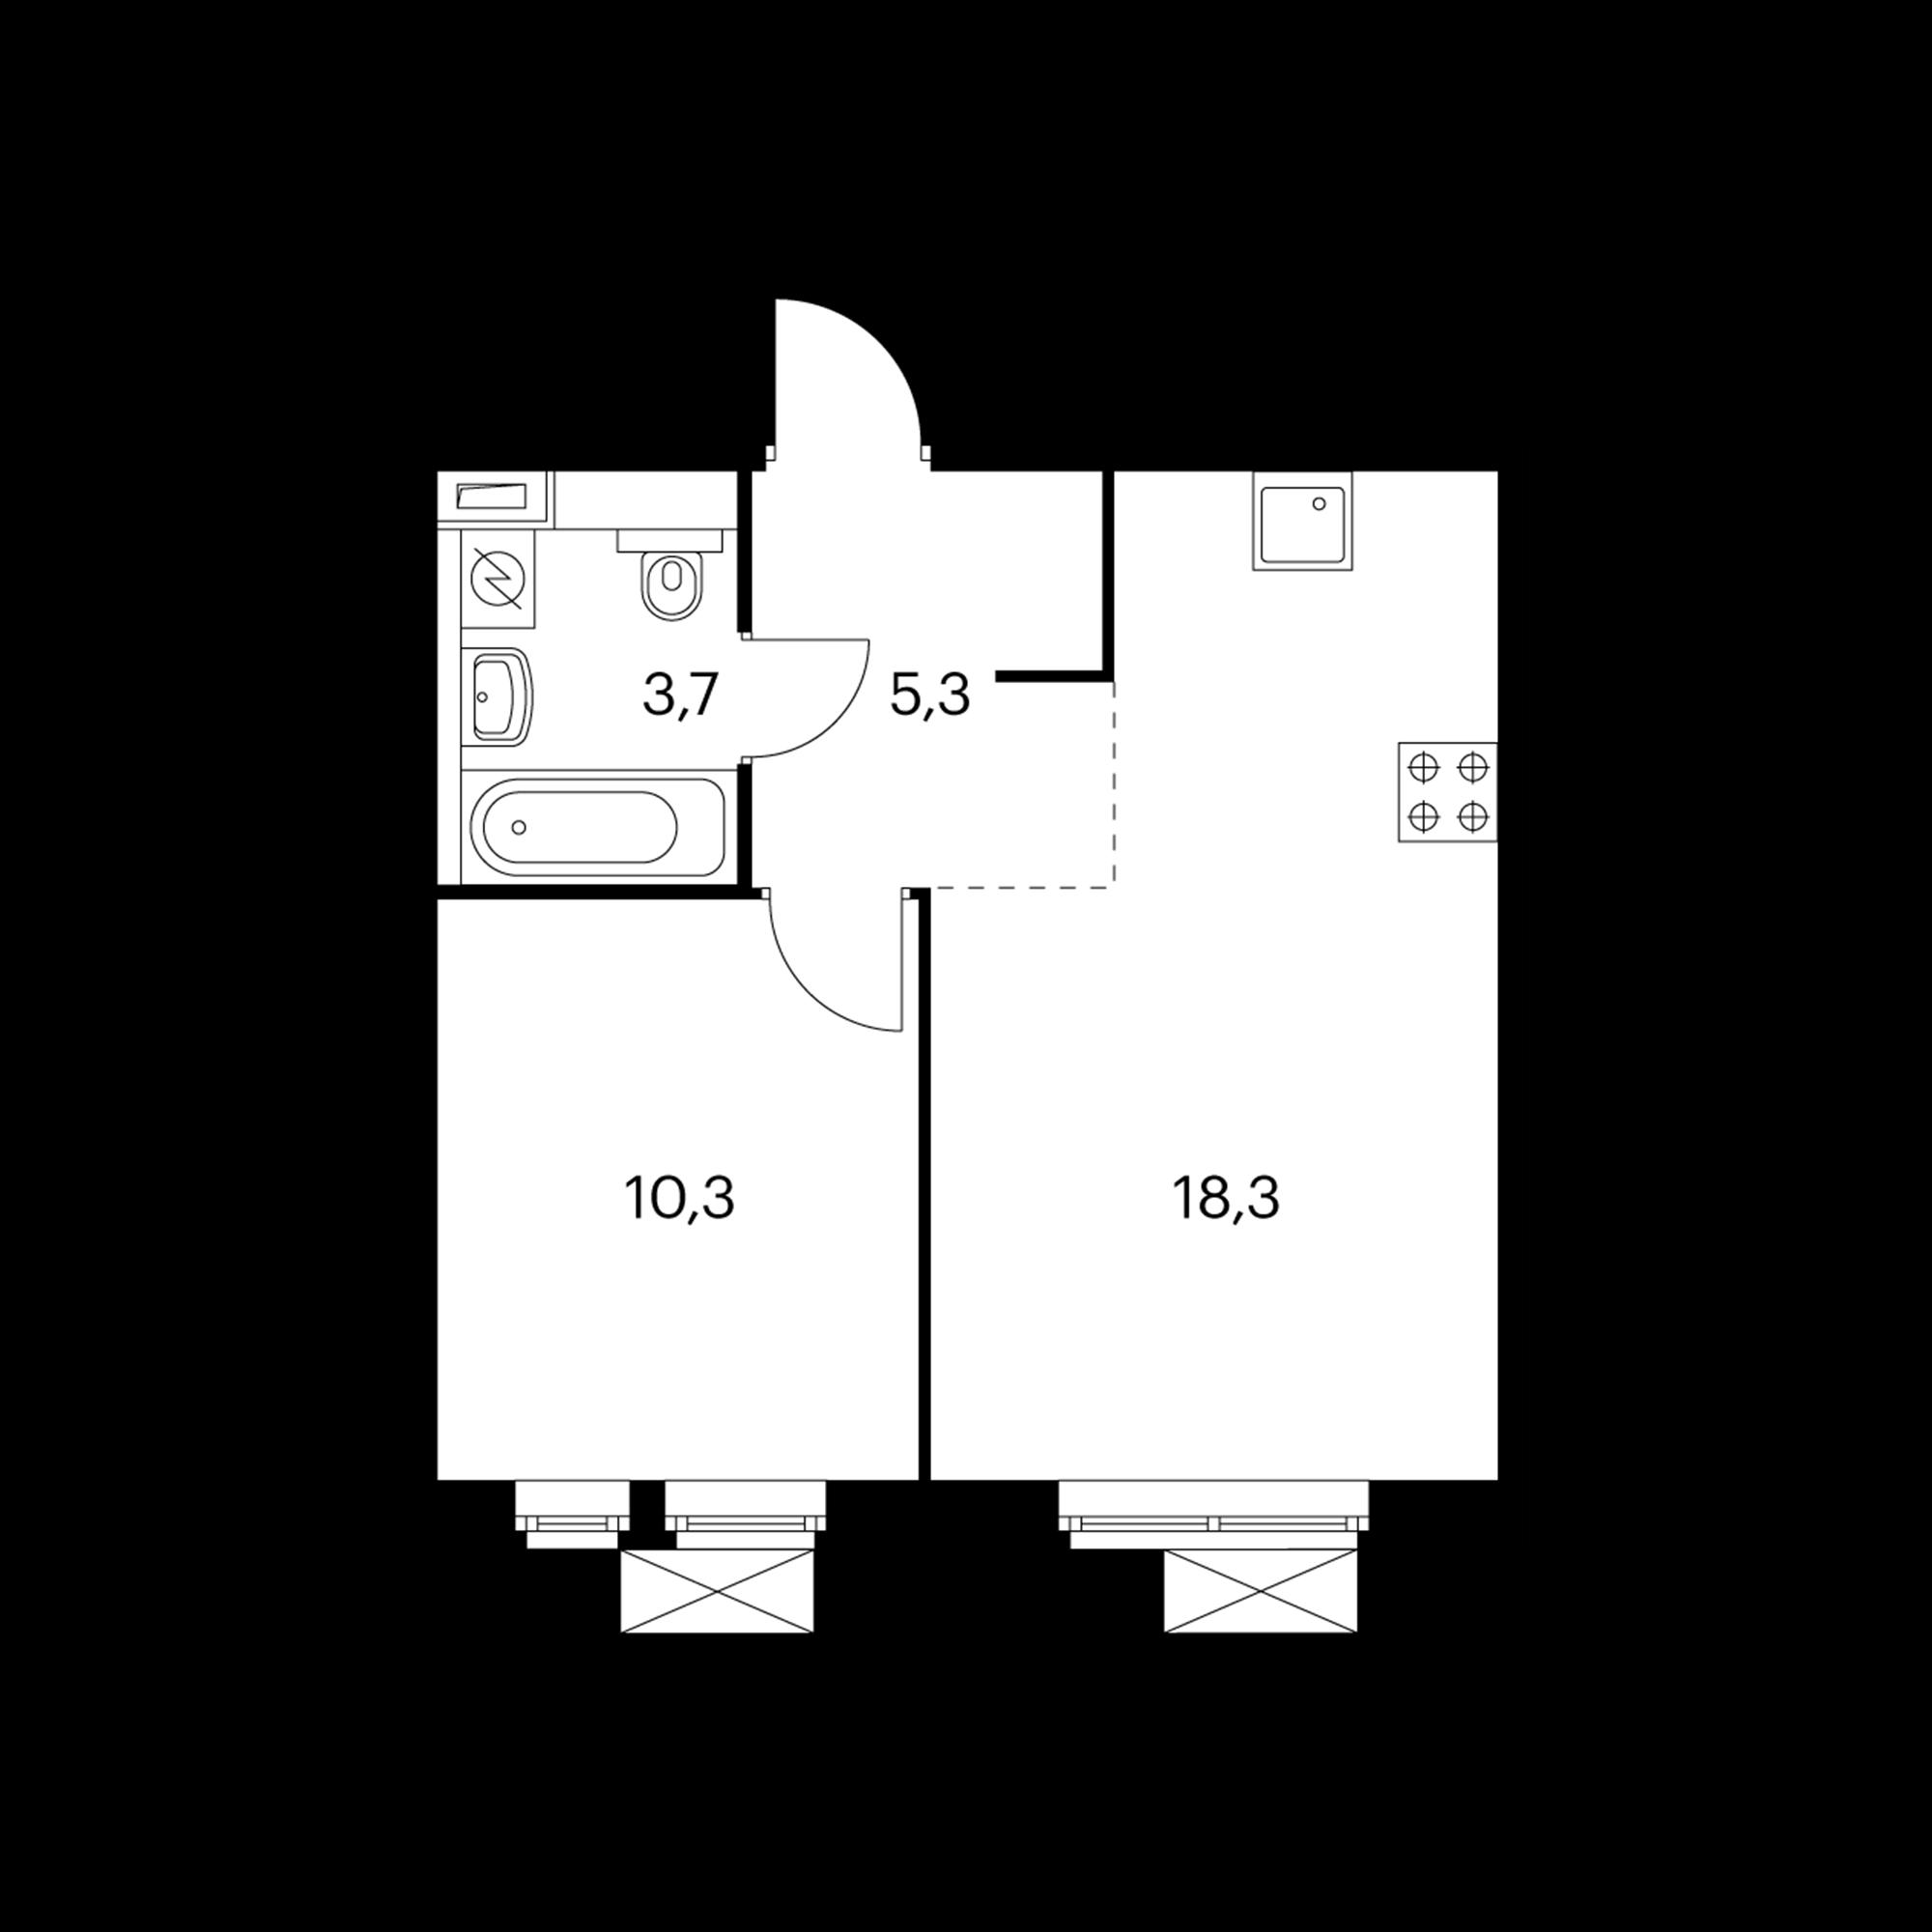 1EM5_6.6-7